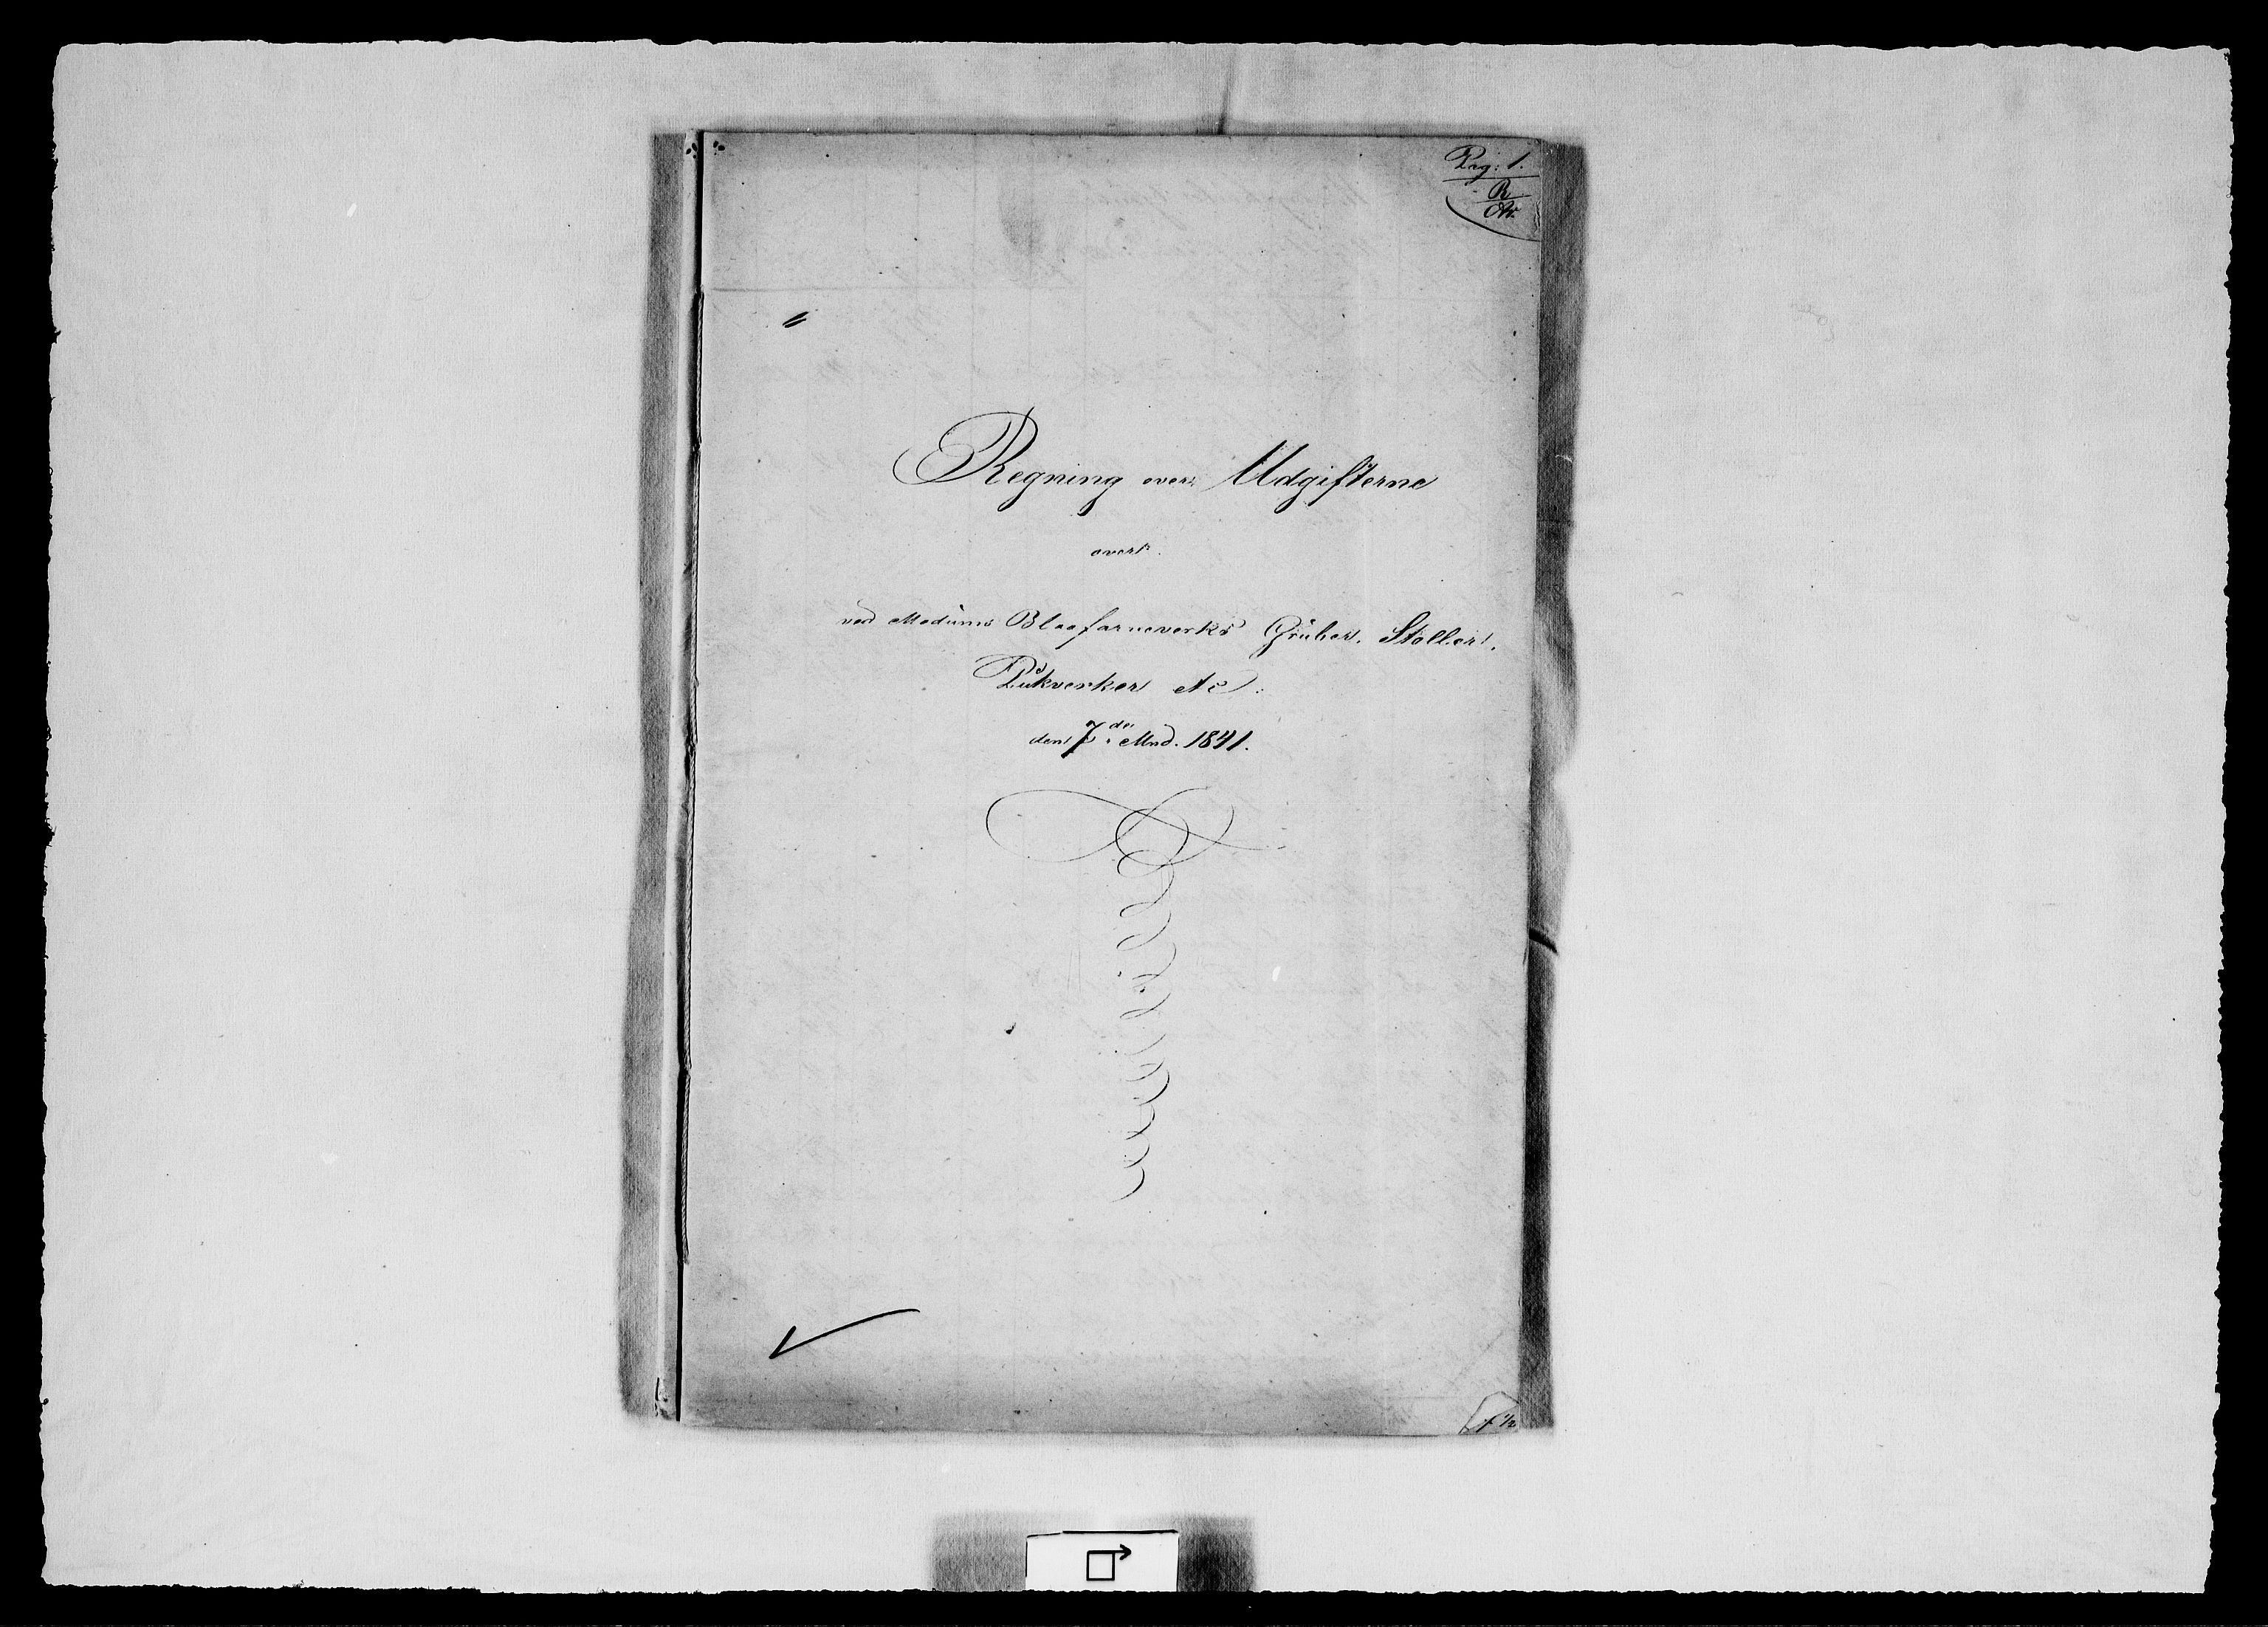 RA, Modums Blaafarveværk, G/Gd/Gdd/L0267, 1841, s. 2